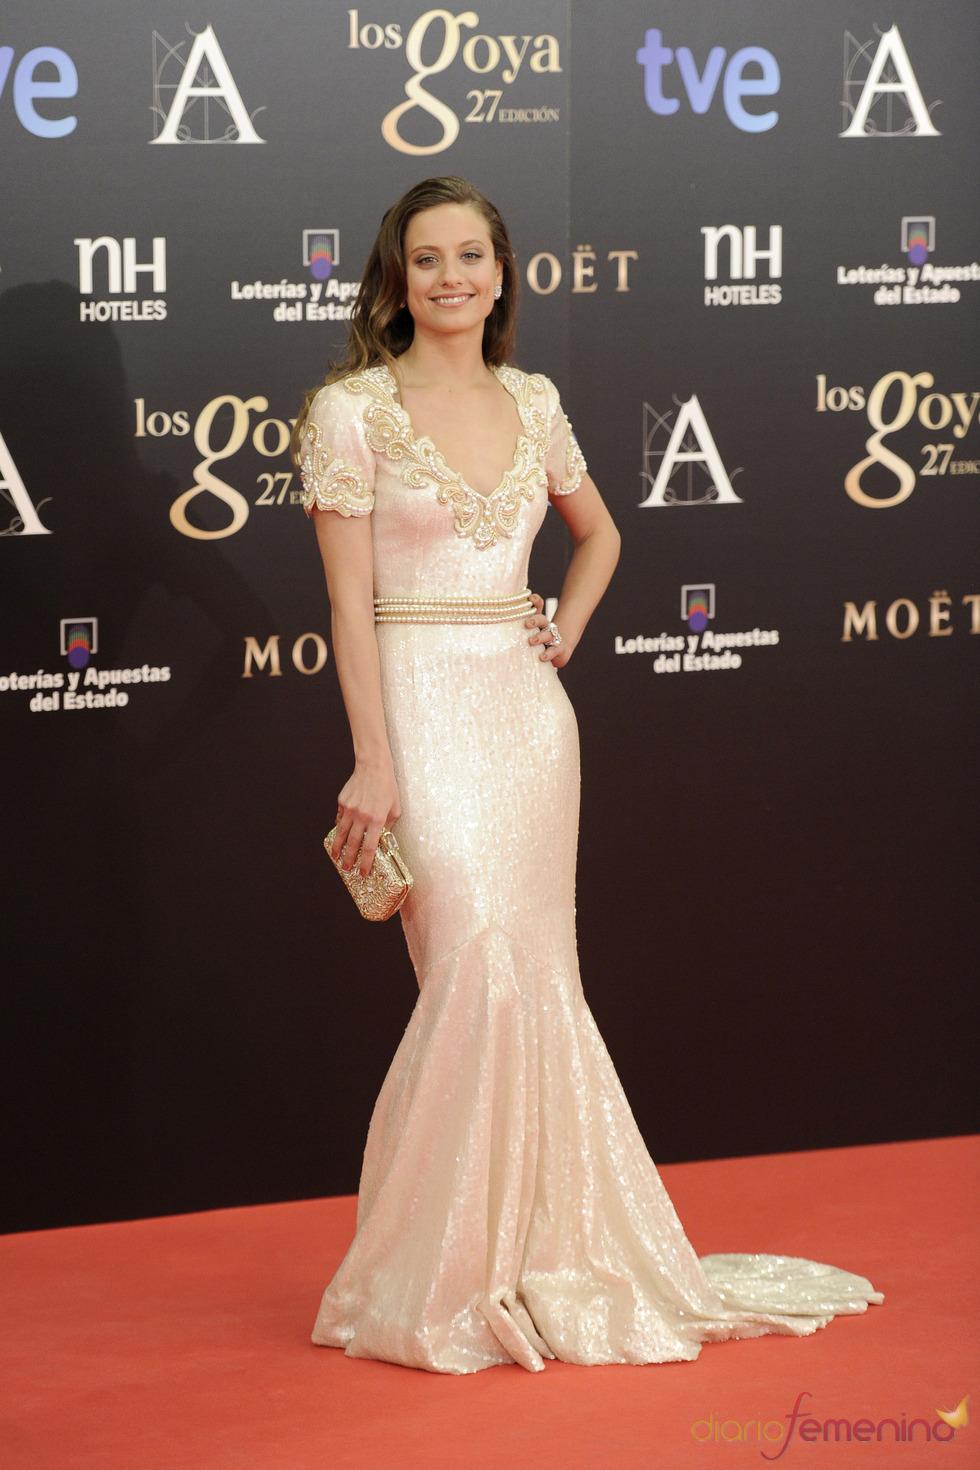 Michelle Jenner en la alfombra roja de los Goya 2013